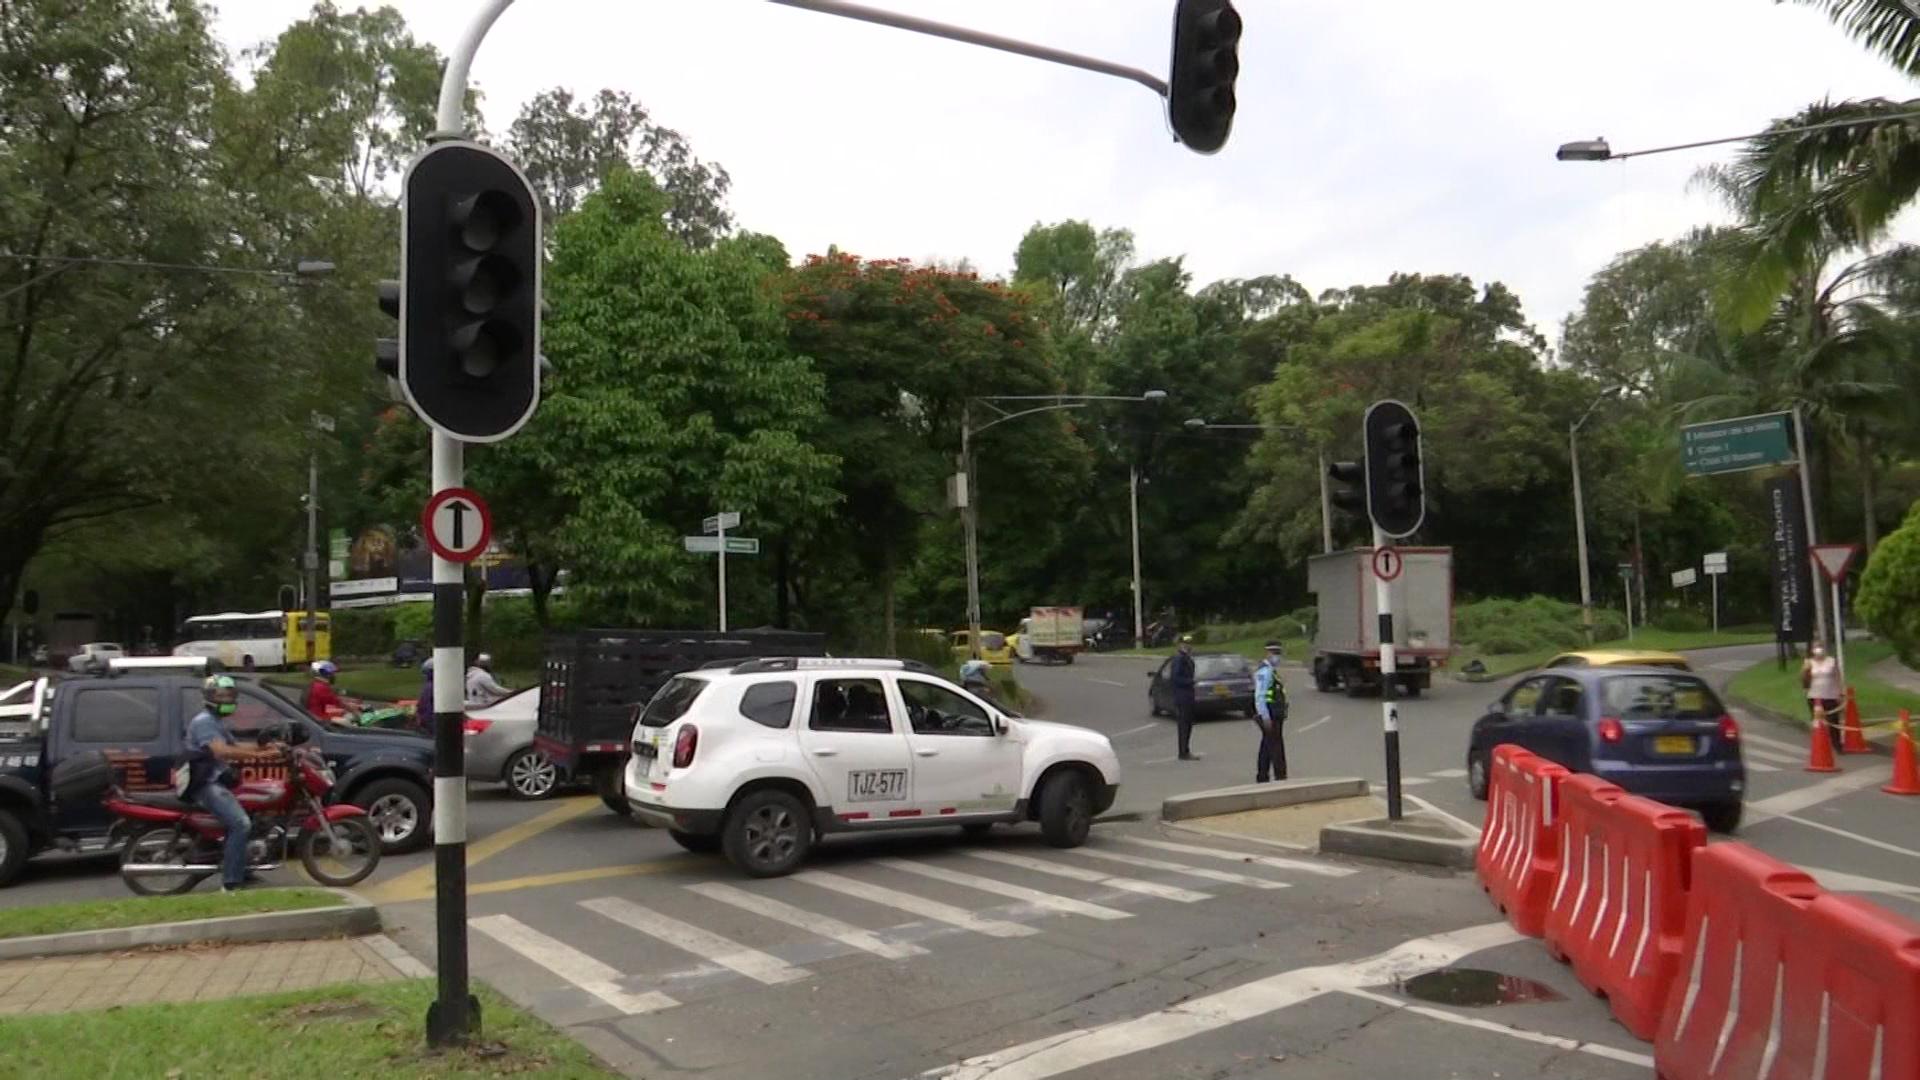 2021: semáforos dañados en 177 cruces. Costo: 3.150 millones